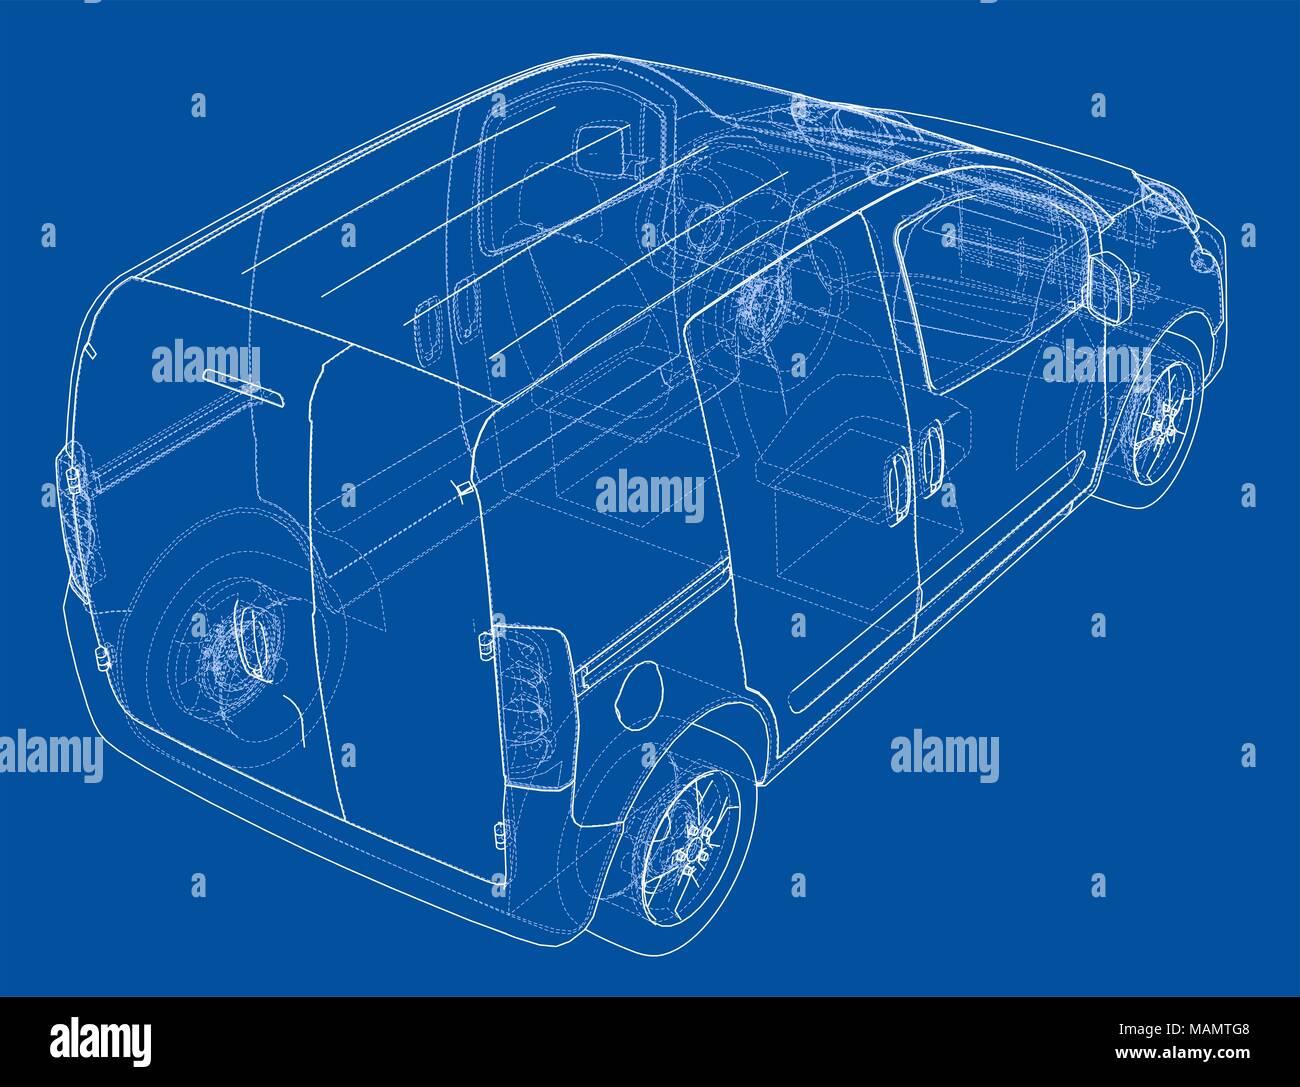 Concept Car Blueprint Stockfoto, Bild: 178708552 - Alamy